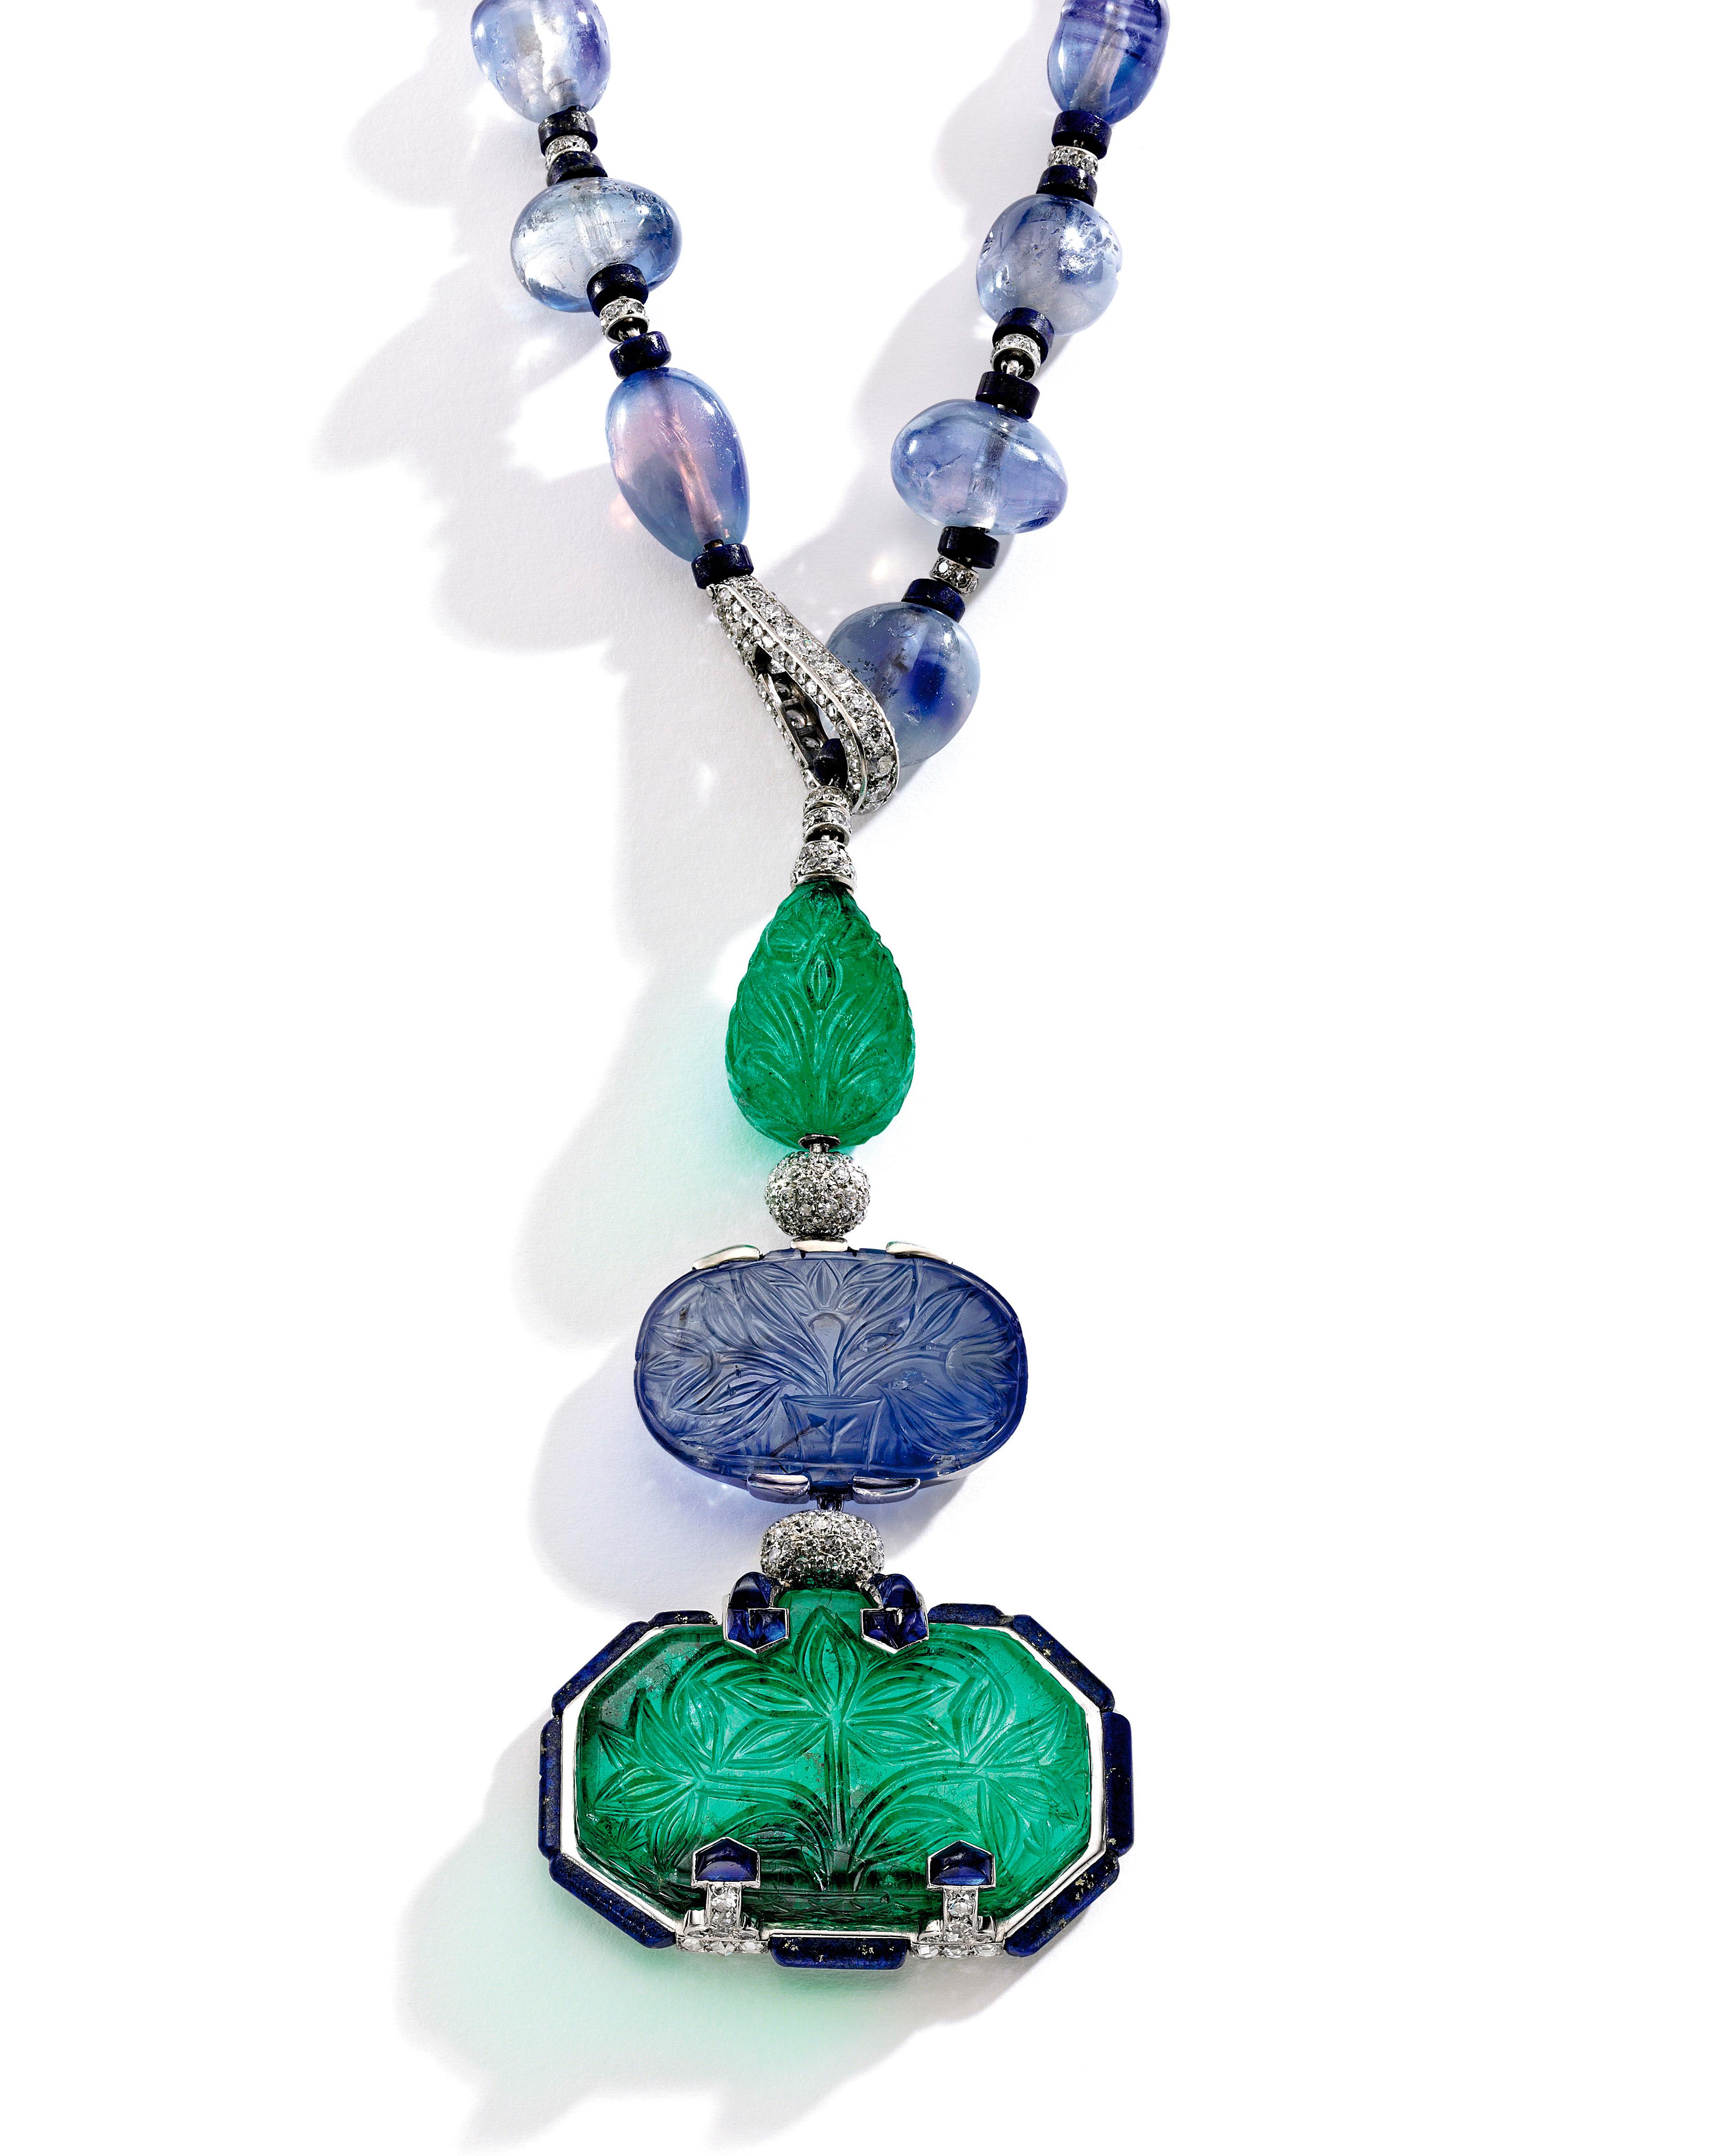 sothebys-ebay-auction-9331-lot-364-0415.jpg